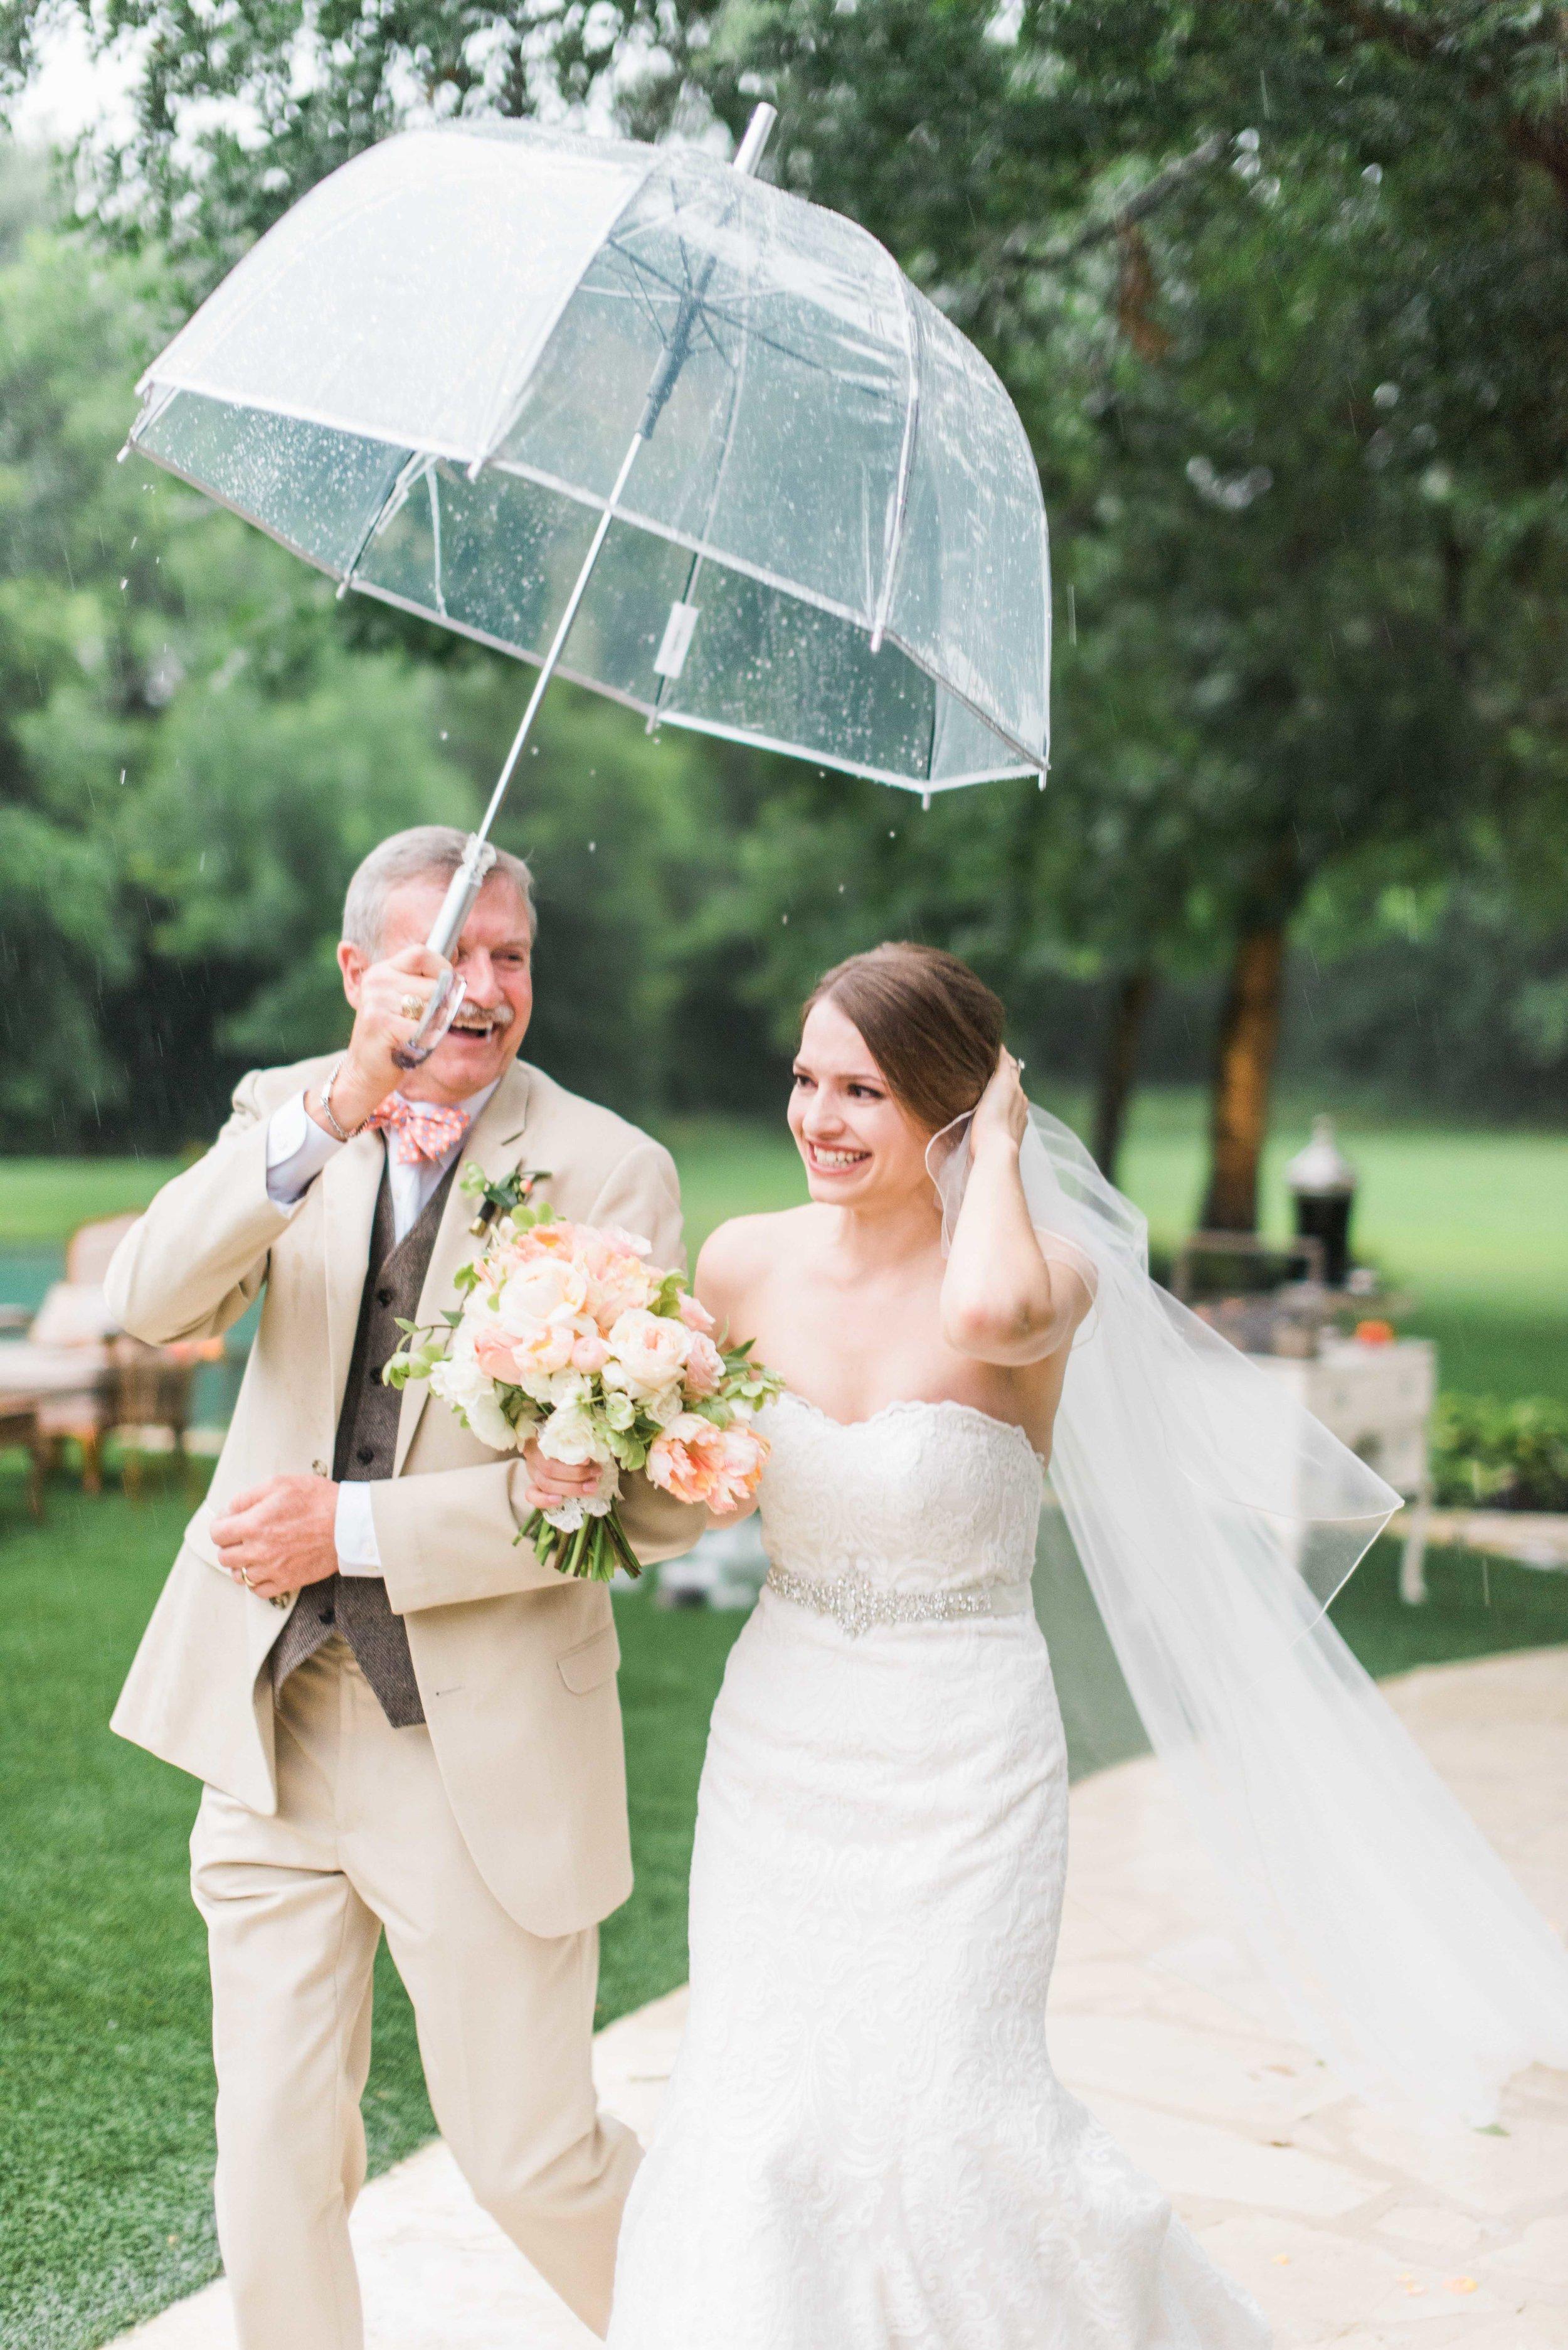 The-Knot-Wedding-Houston-Photographer-Fine-Art-Dana-Fernandez-Photography-Film-10 copy.jpg